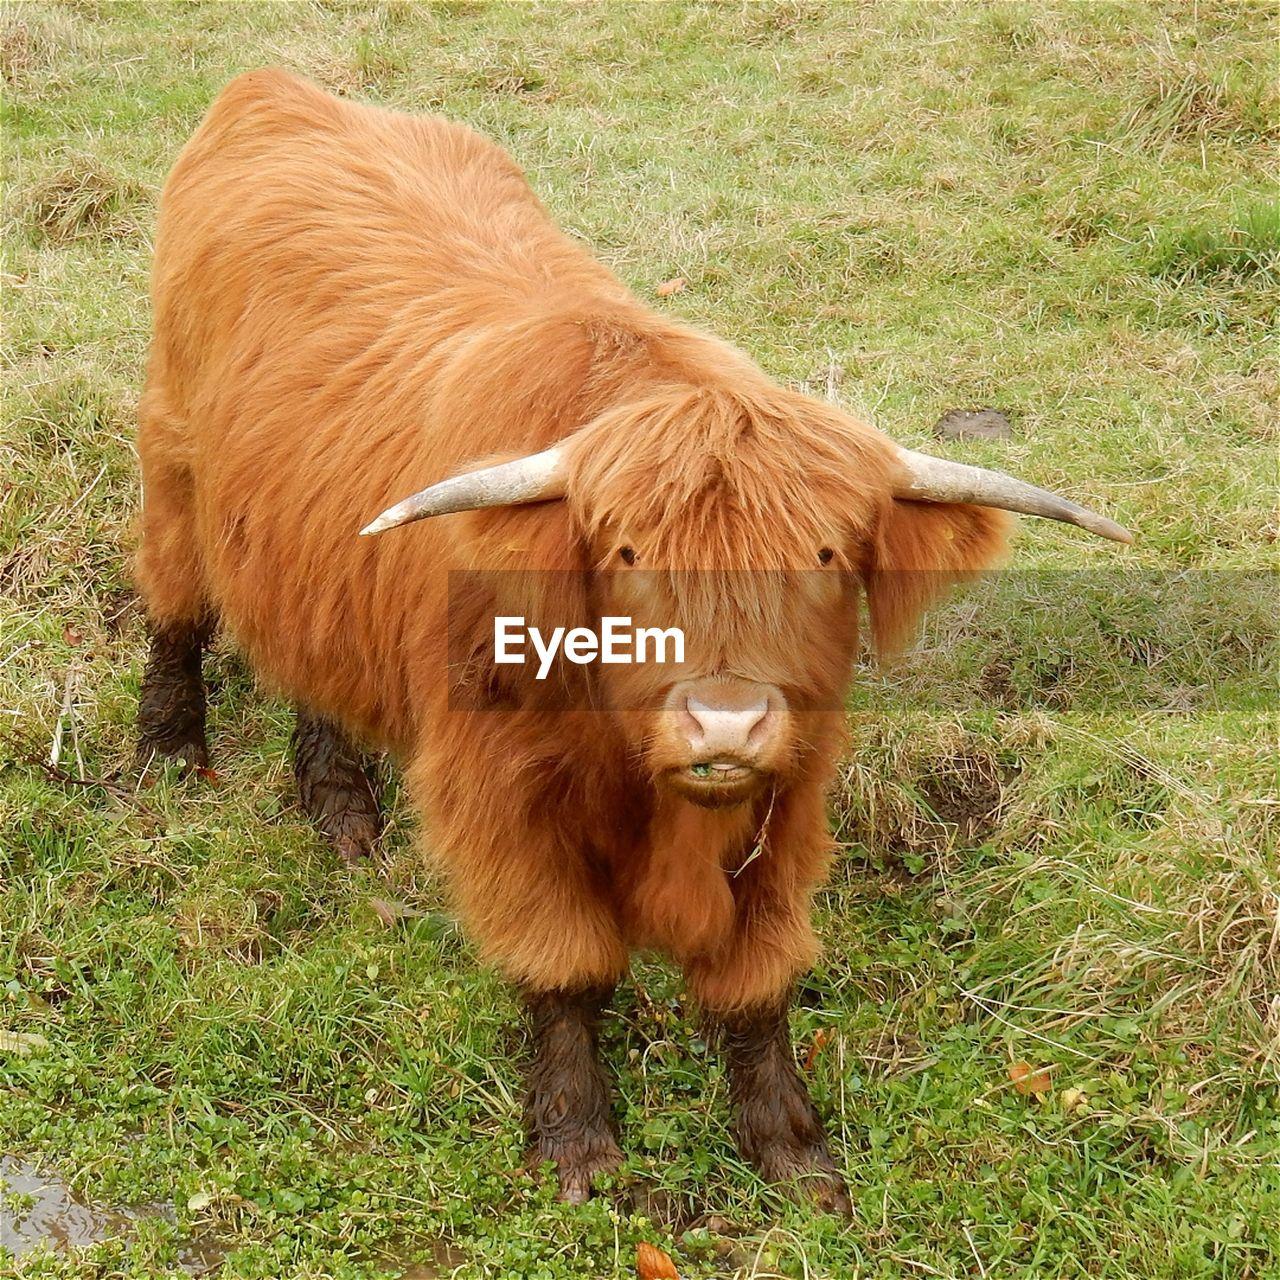 Highland cattle on grassy field